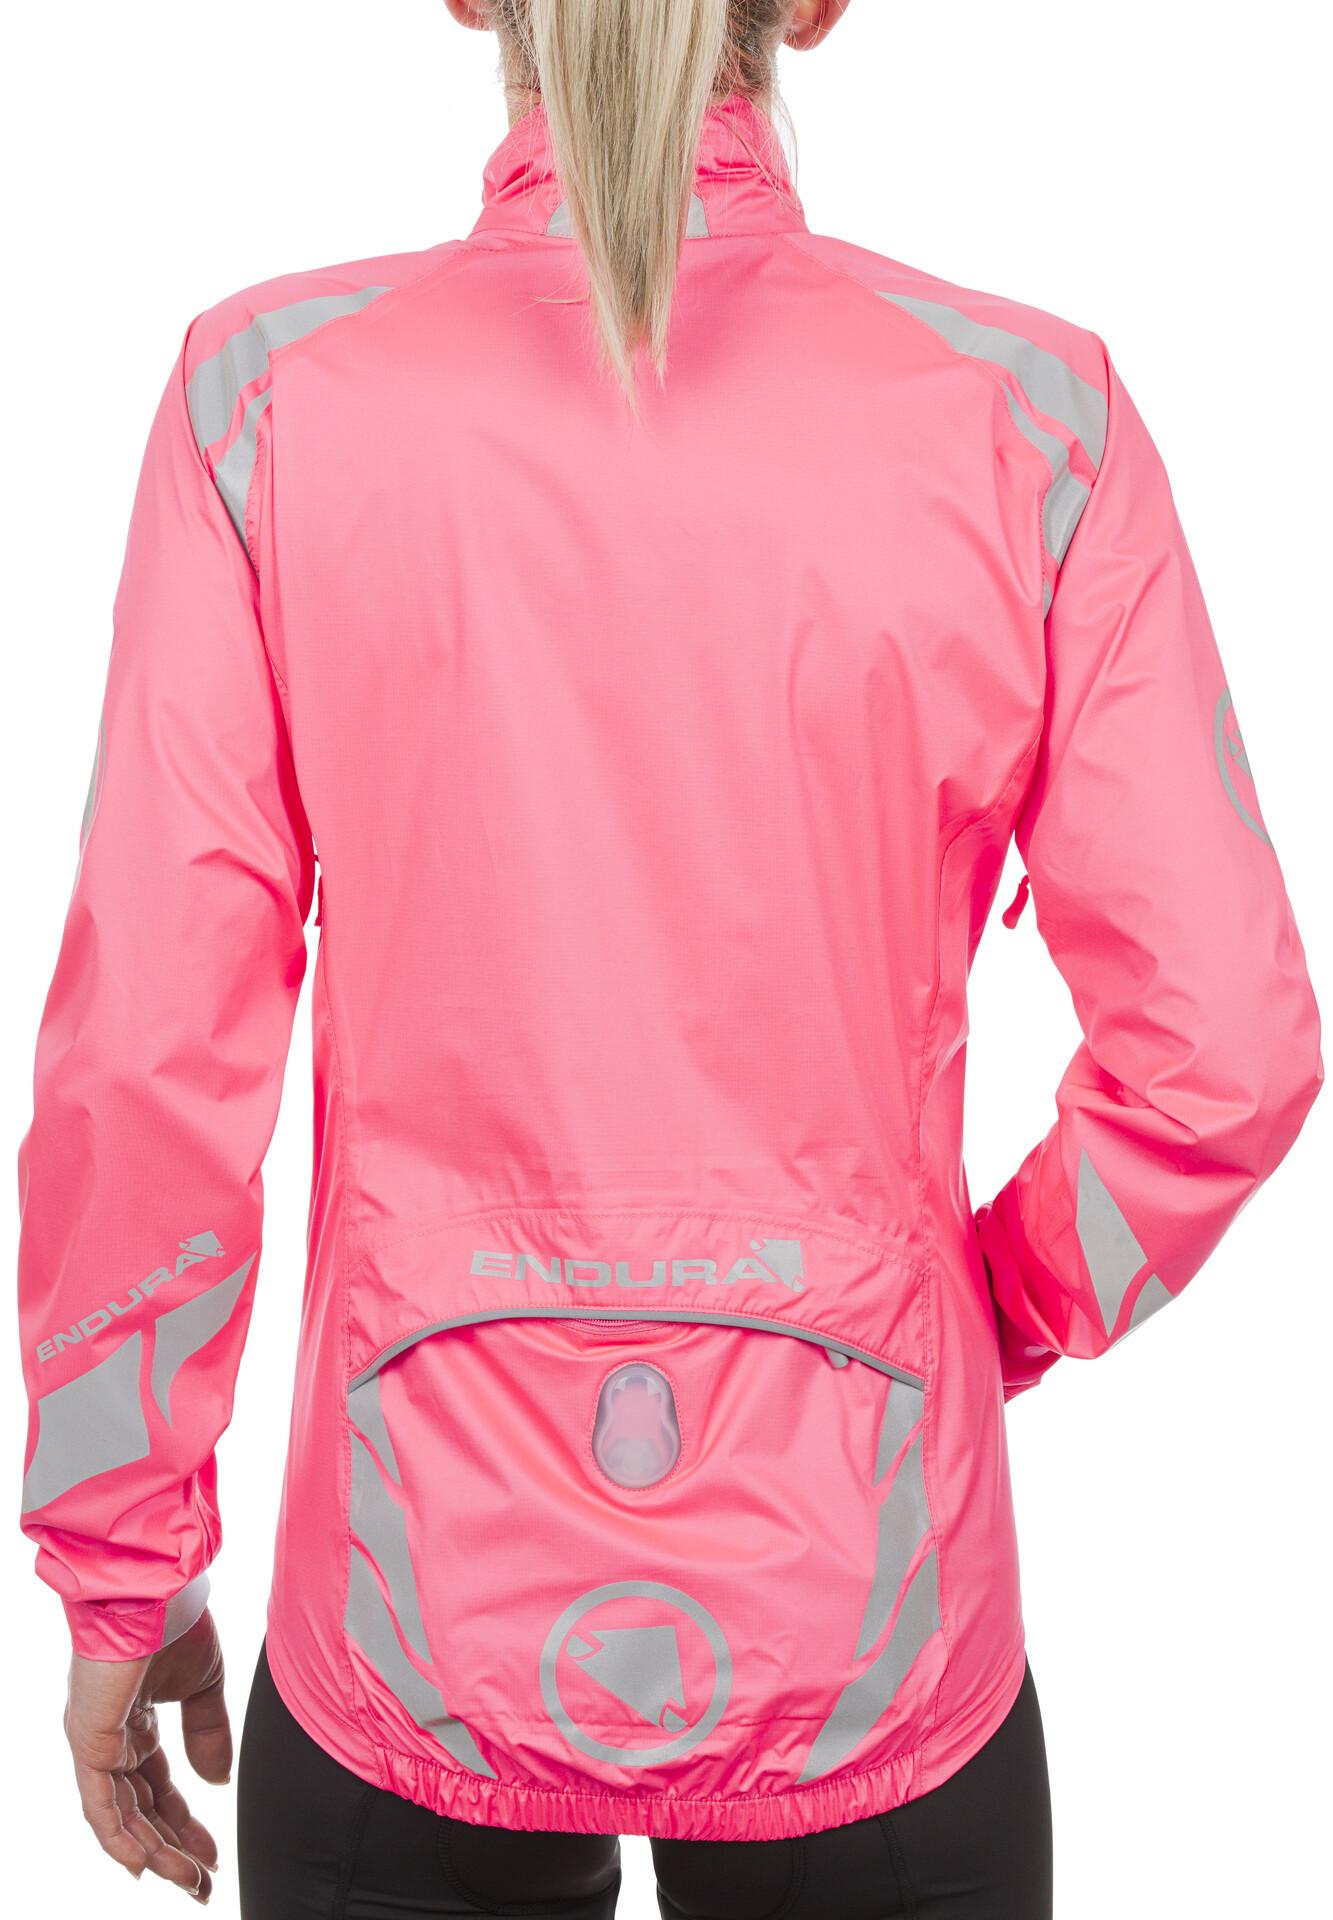 es Endura Mujer Bikester Rosa Ii Luminite Chaqueta ftw4qrYt